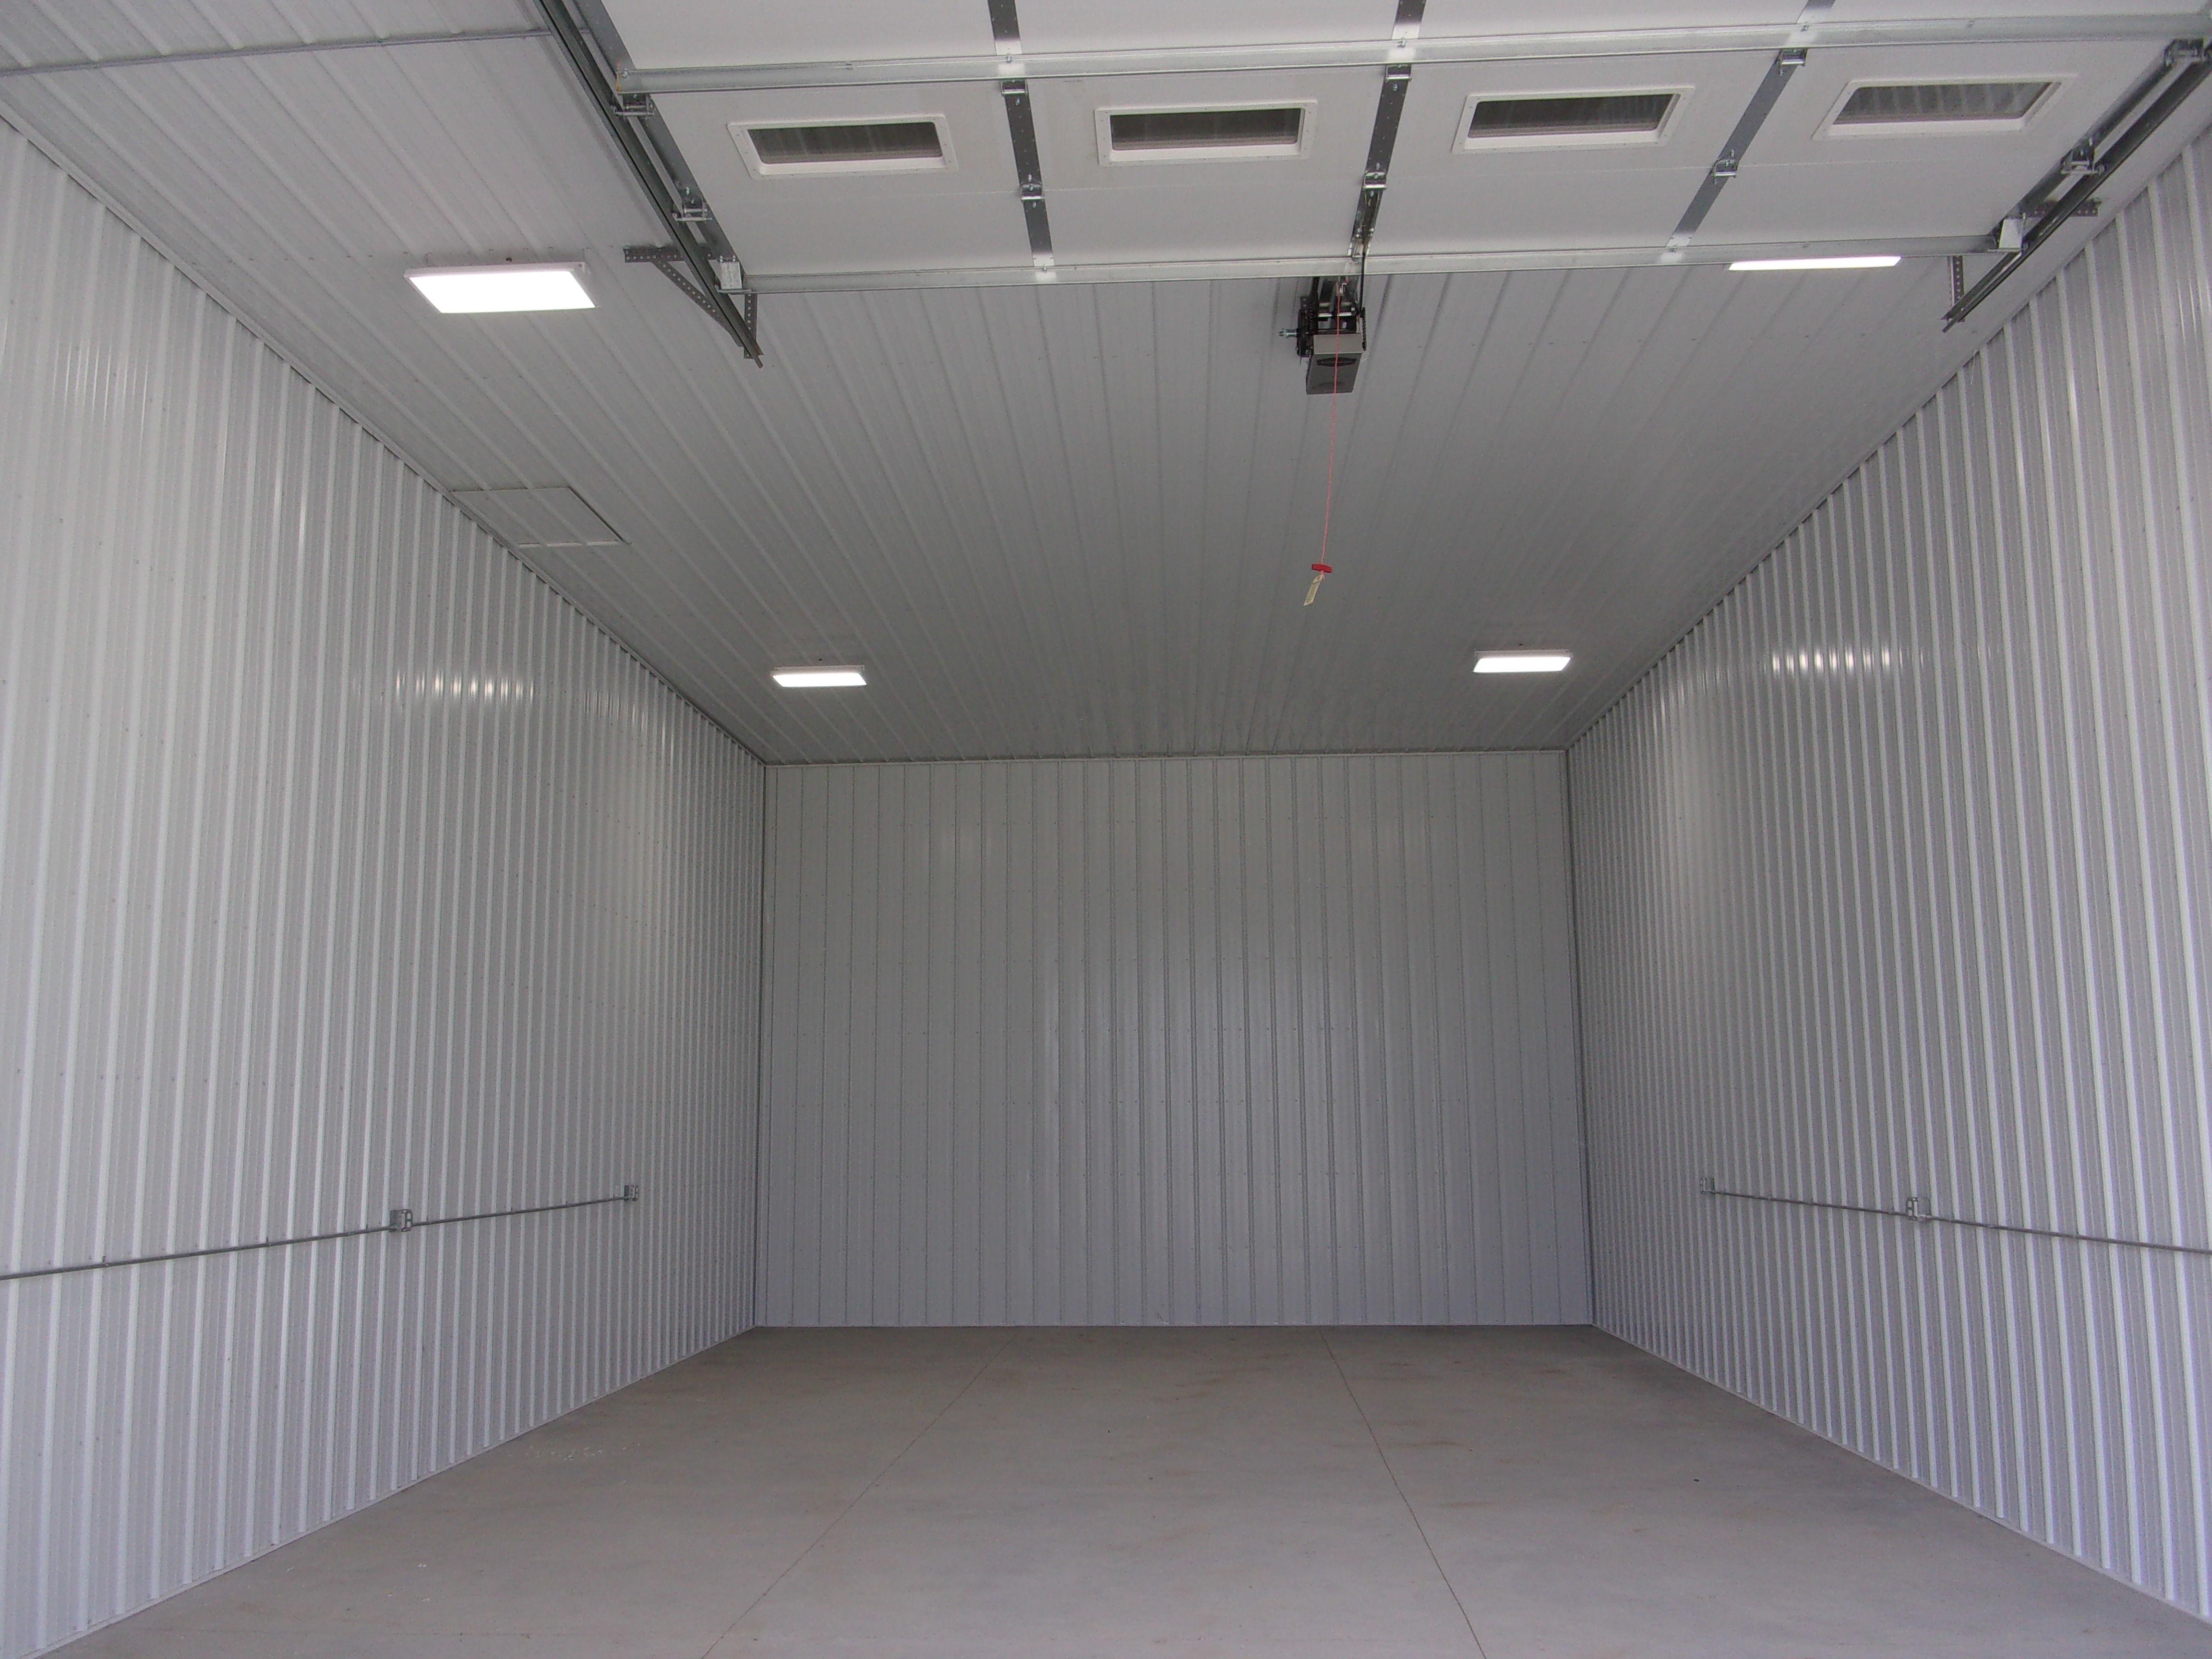 Ridgeview Shop Storage image 2